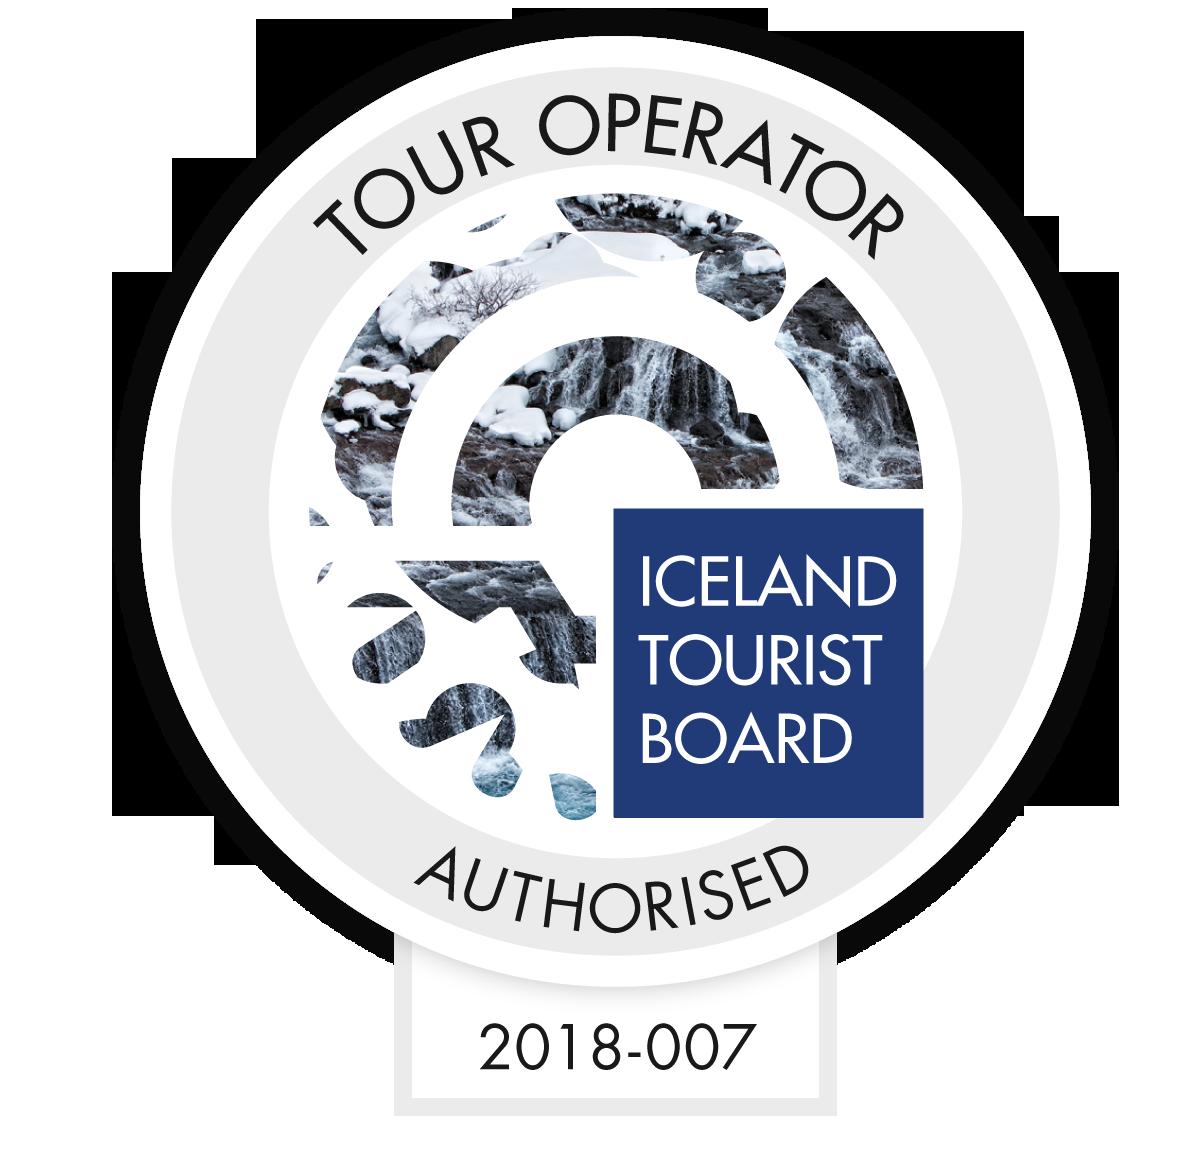 tour-operator-iceland-tourist-board-2018